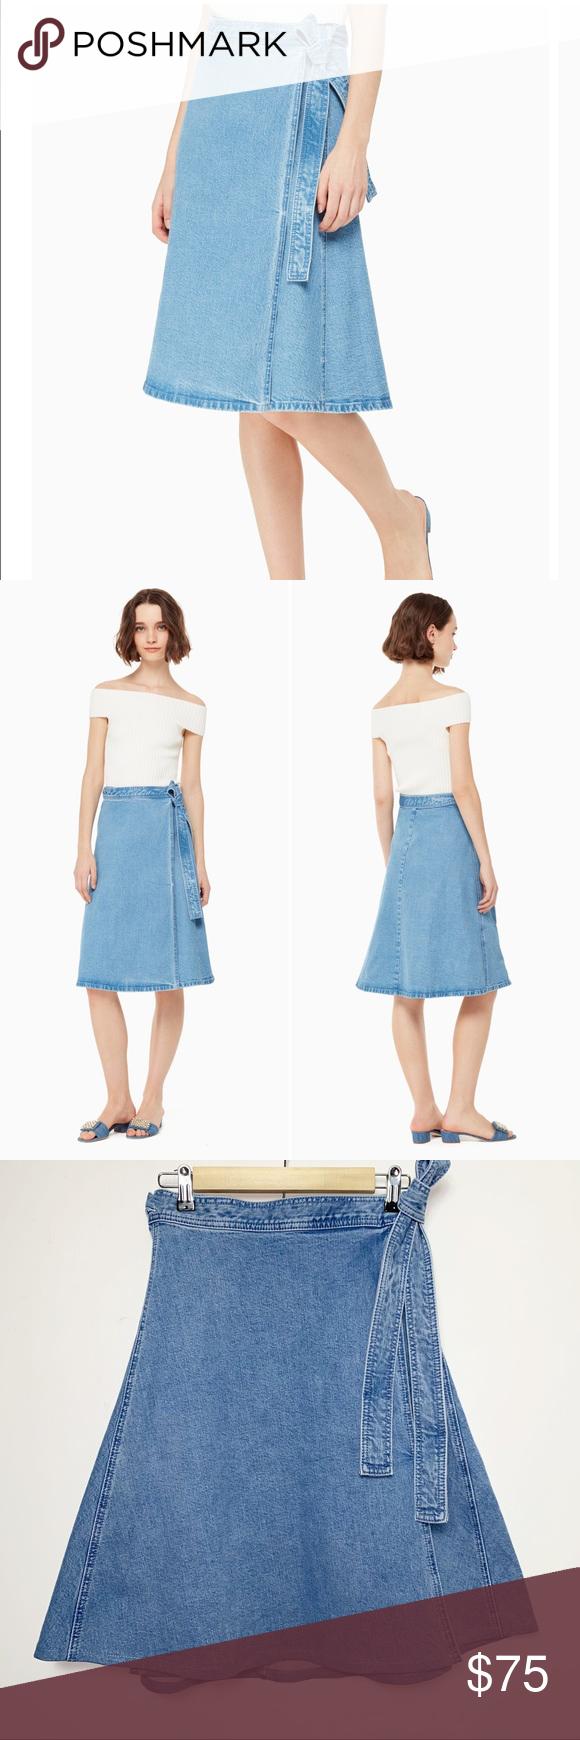 Kate Spade Vintage Denim Wrap Midi Skirt Size 2 Kate Spade vintage denim wrap sk…